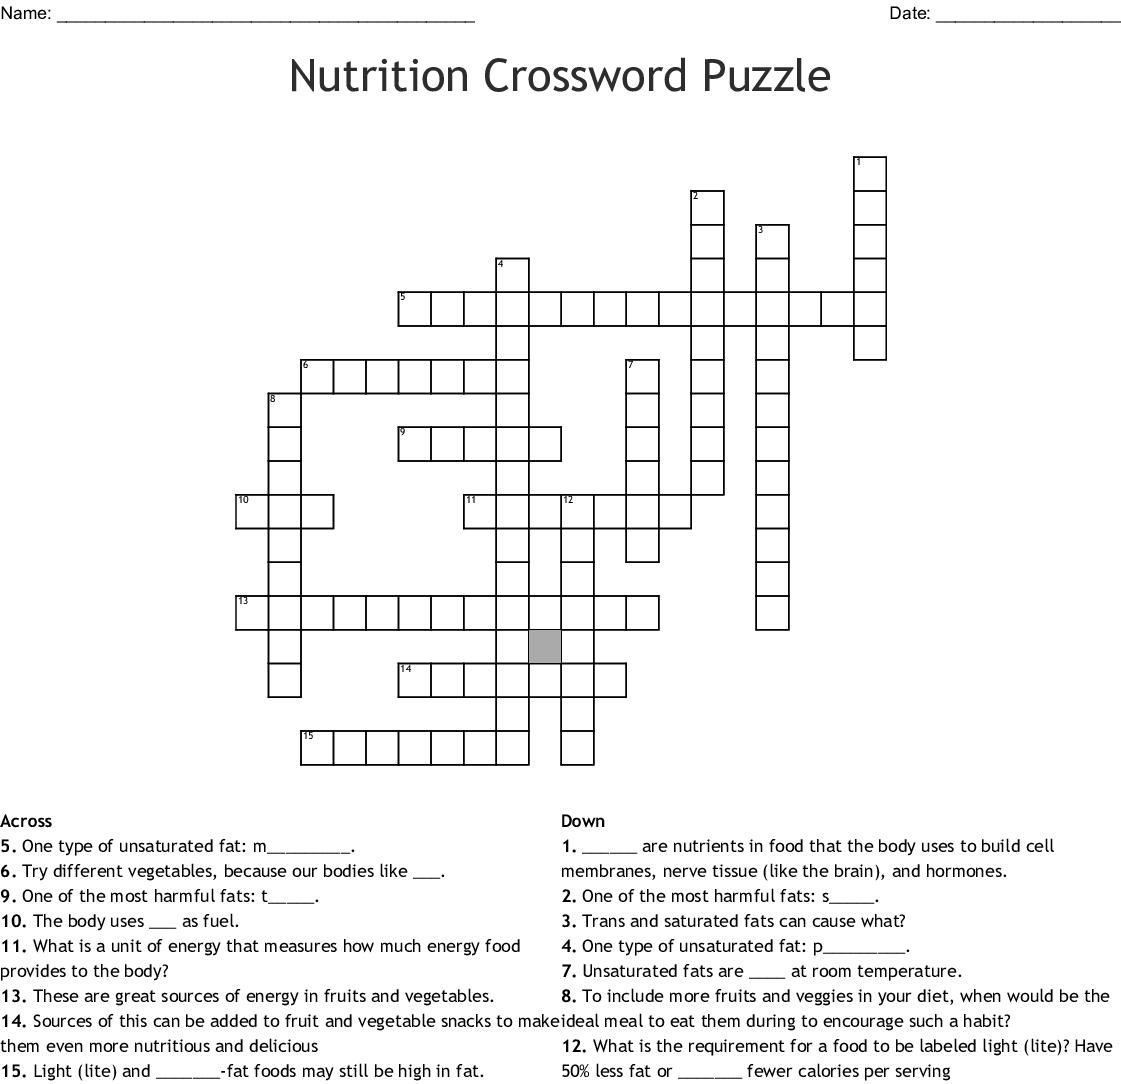 Nutrition Crossword Puzzle Crossword